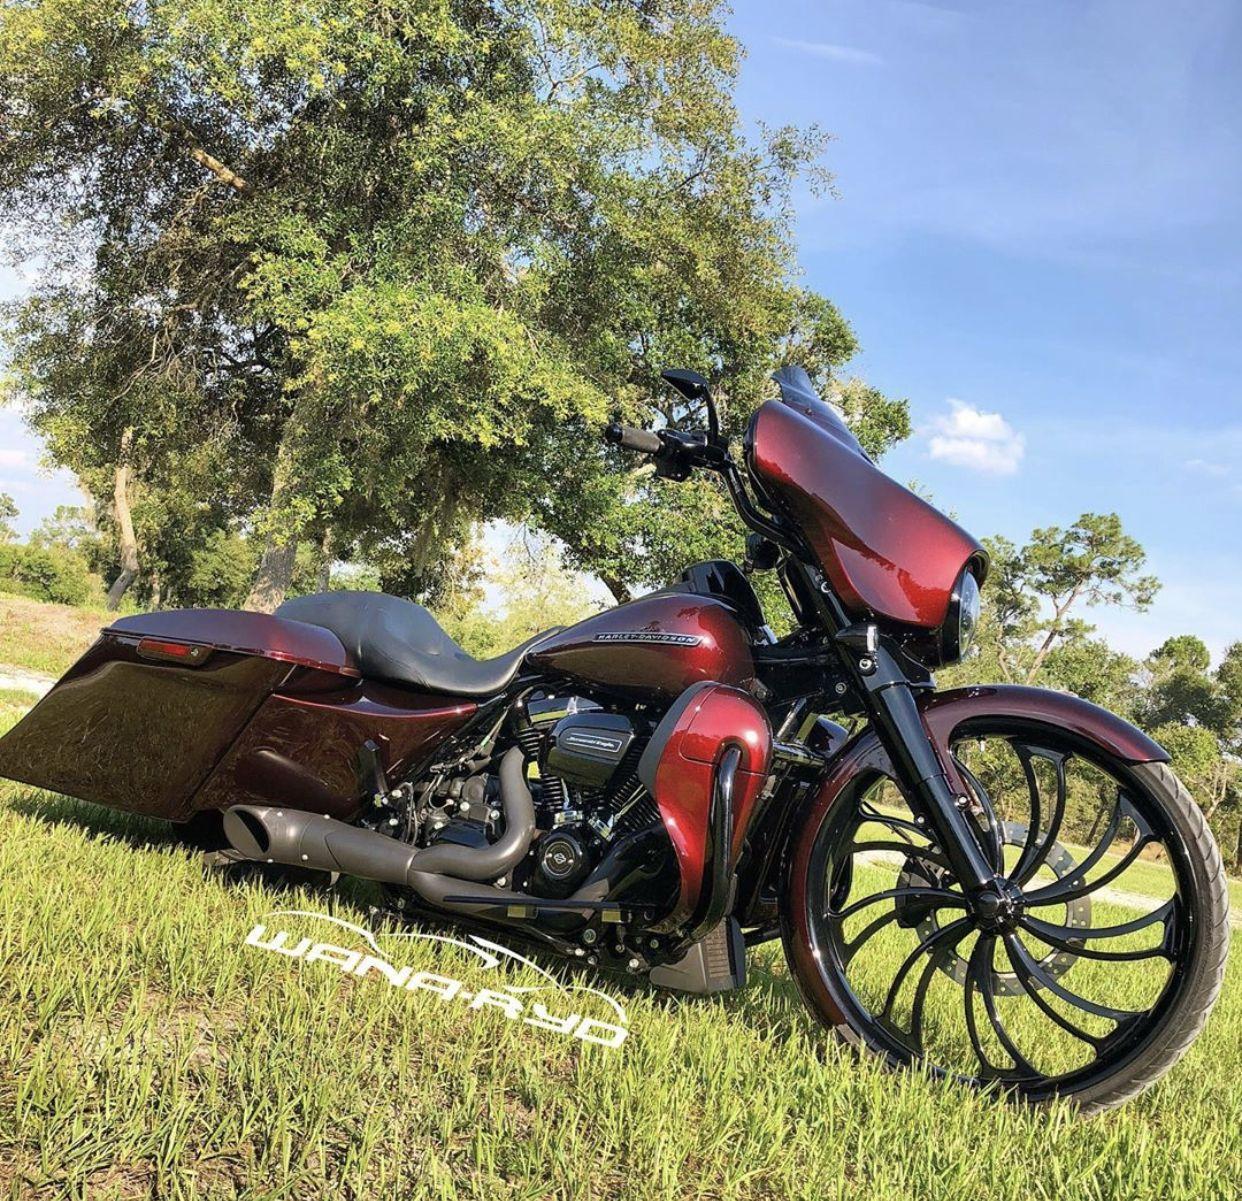 Pin By Soul On Iron On Baggers Bagger Cool Bikes Custom Bikes [ 1201 x 1242 Pixel ]